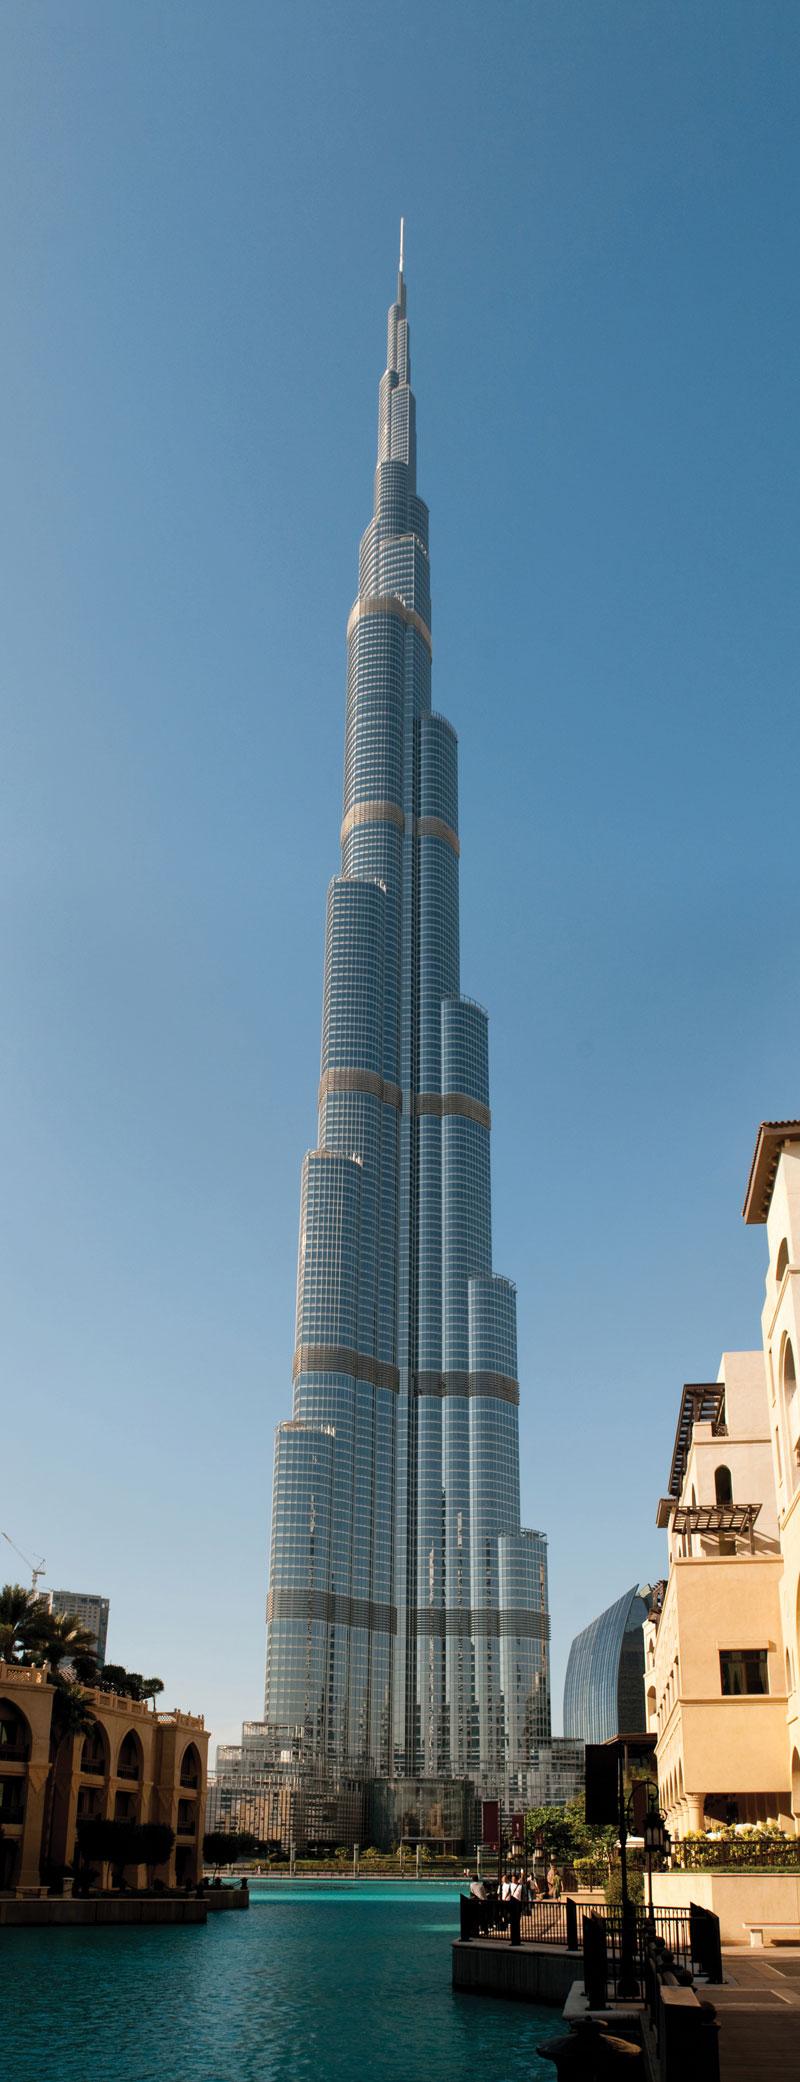 Burj Khalifa (Photo © lexan/Shutterstock.com)